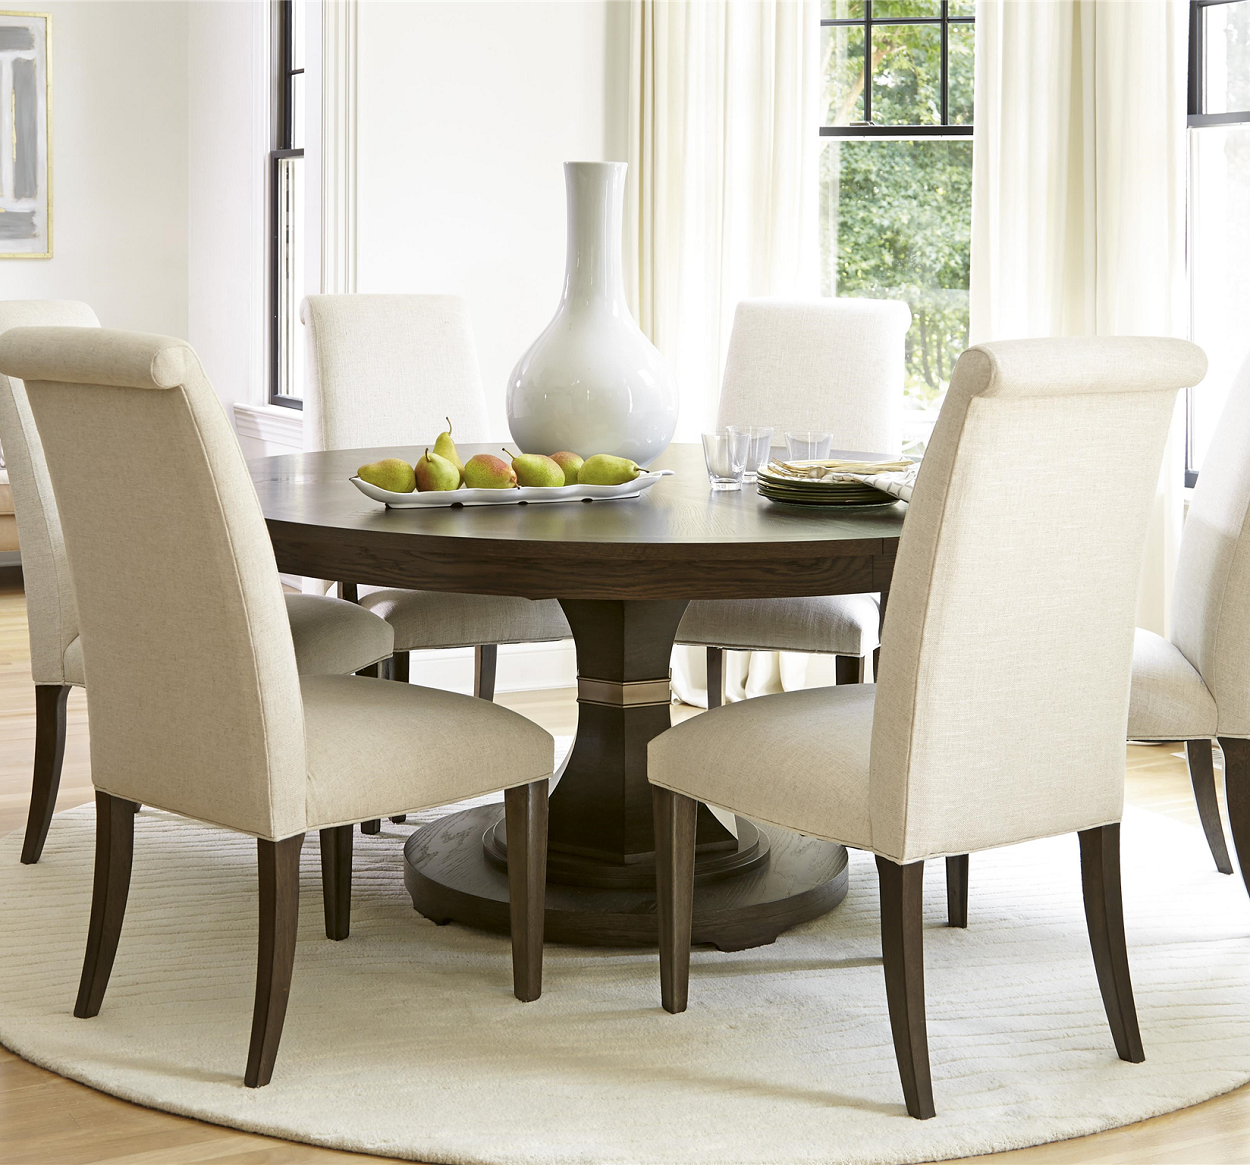 Rustic Oak 7 Piece Round Dining Room